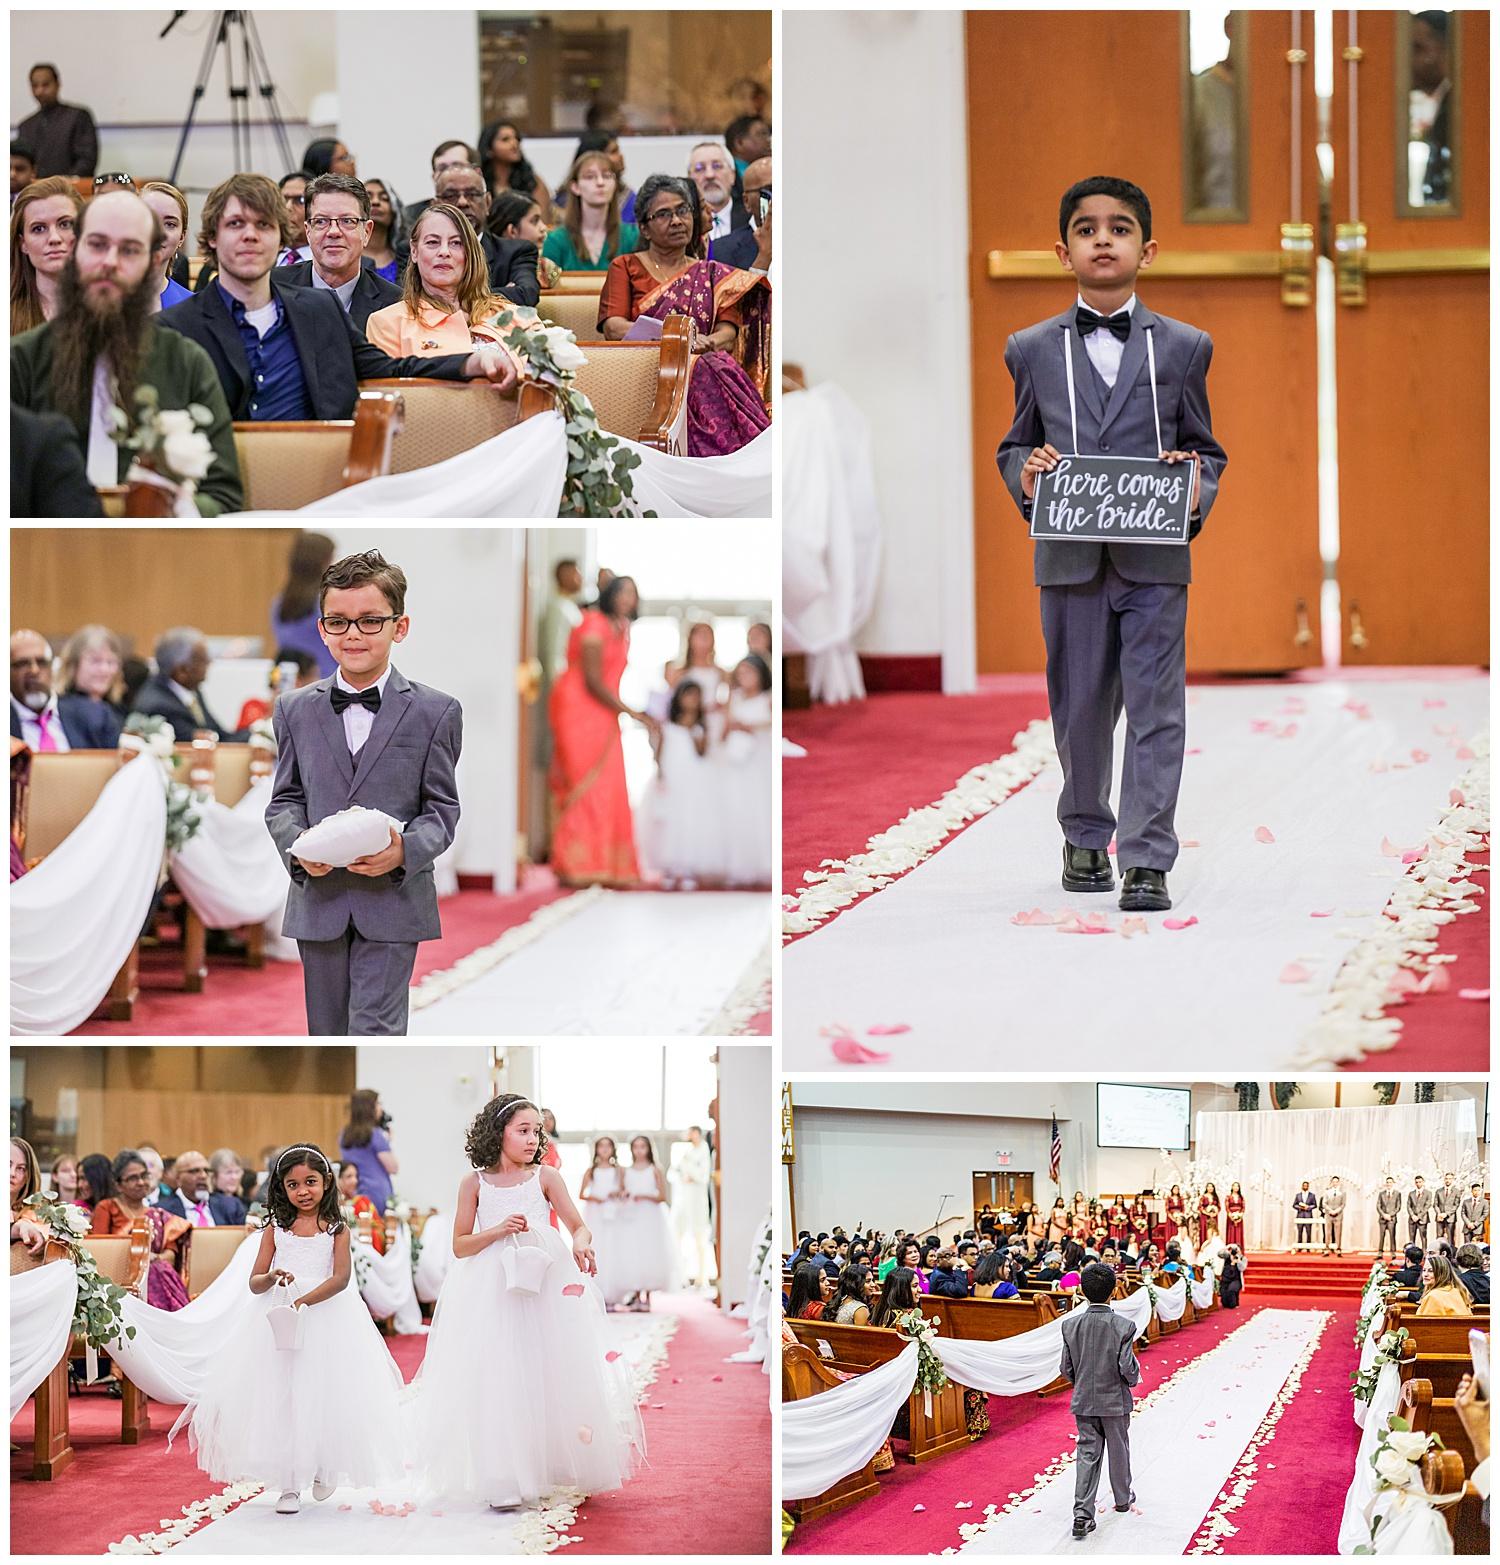 J+L Martins West Indian Wedding Living Radiant Photography photos_0040.jpg